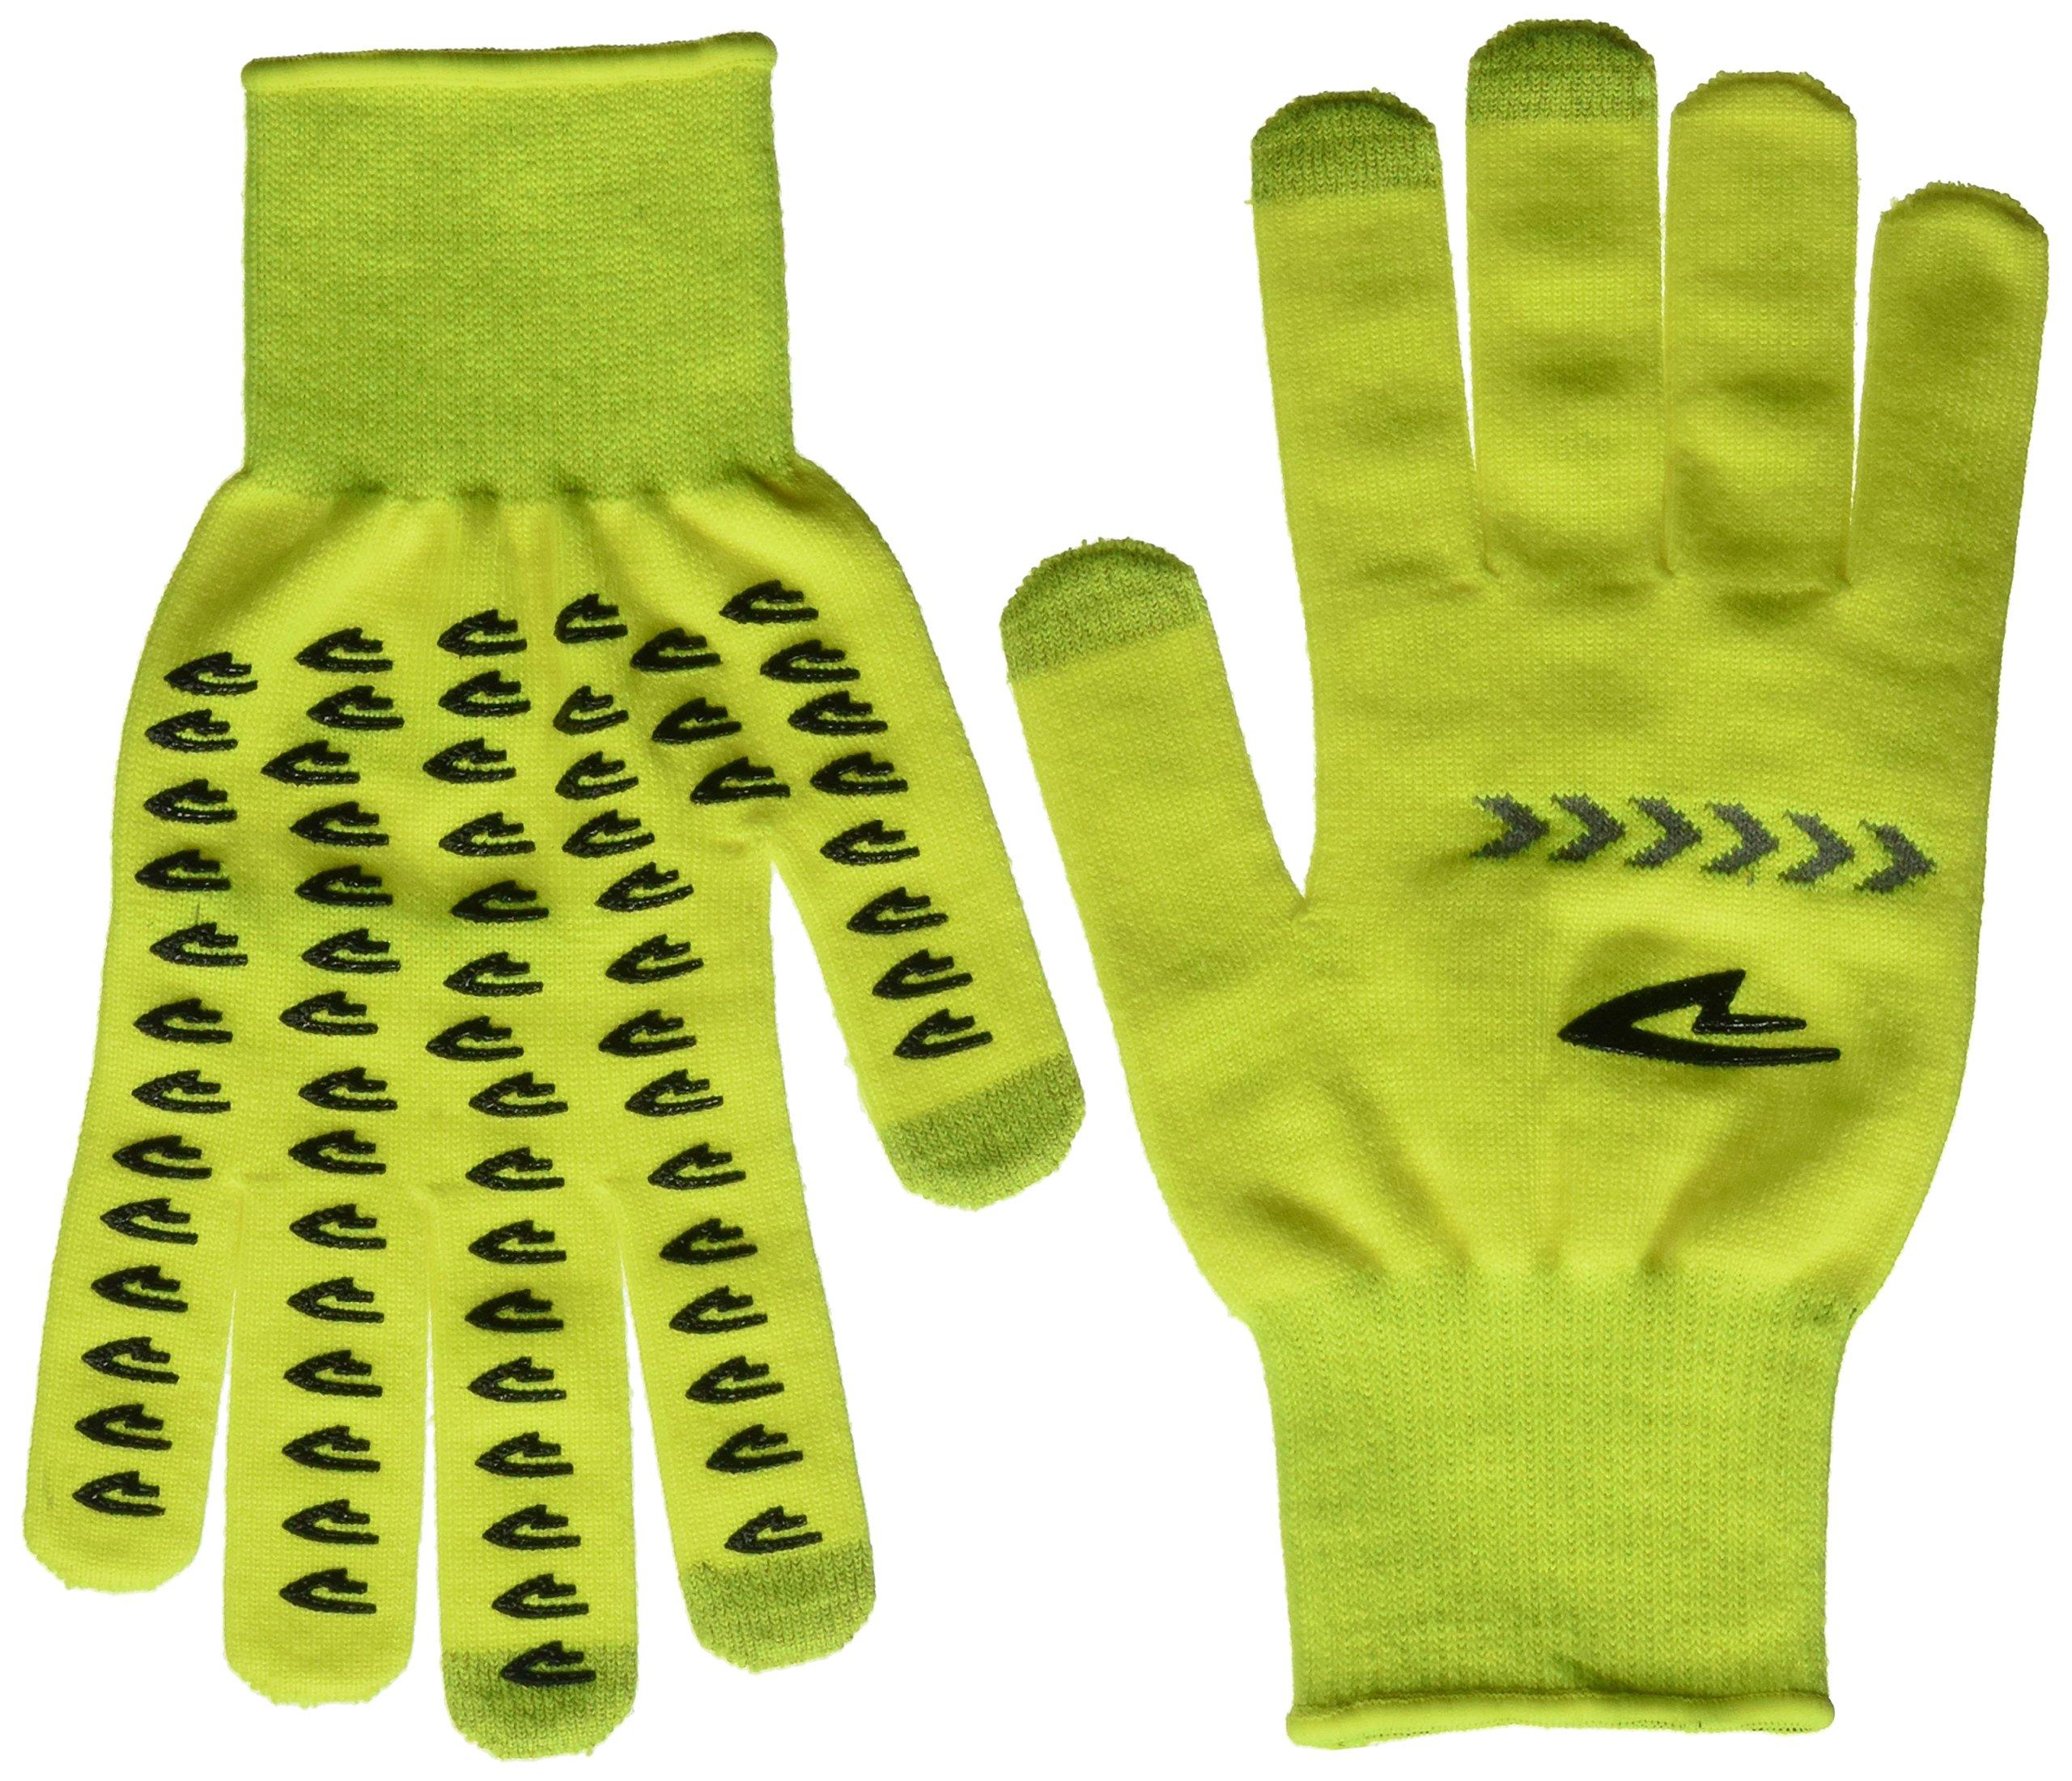 DEFEET Duraglove Reflector Gloves, Hi-Vis Yellow/Reflective Stripe, X-Small